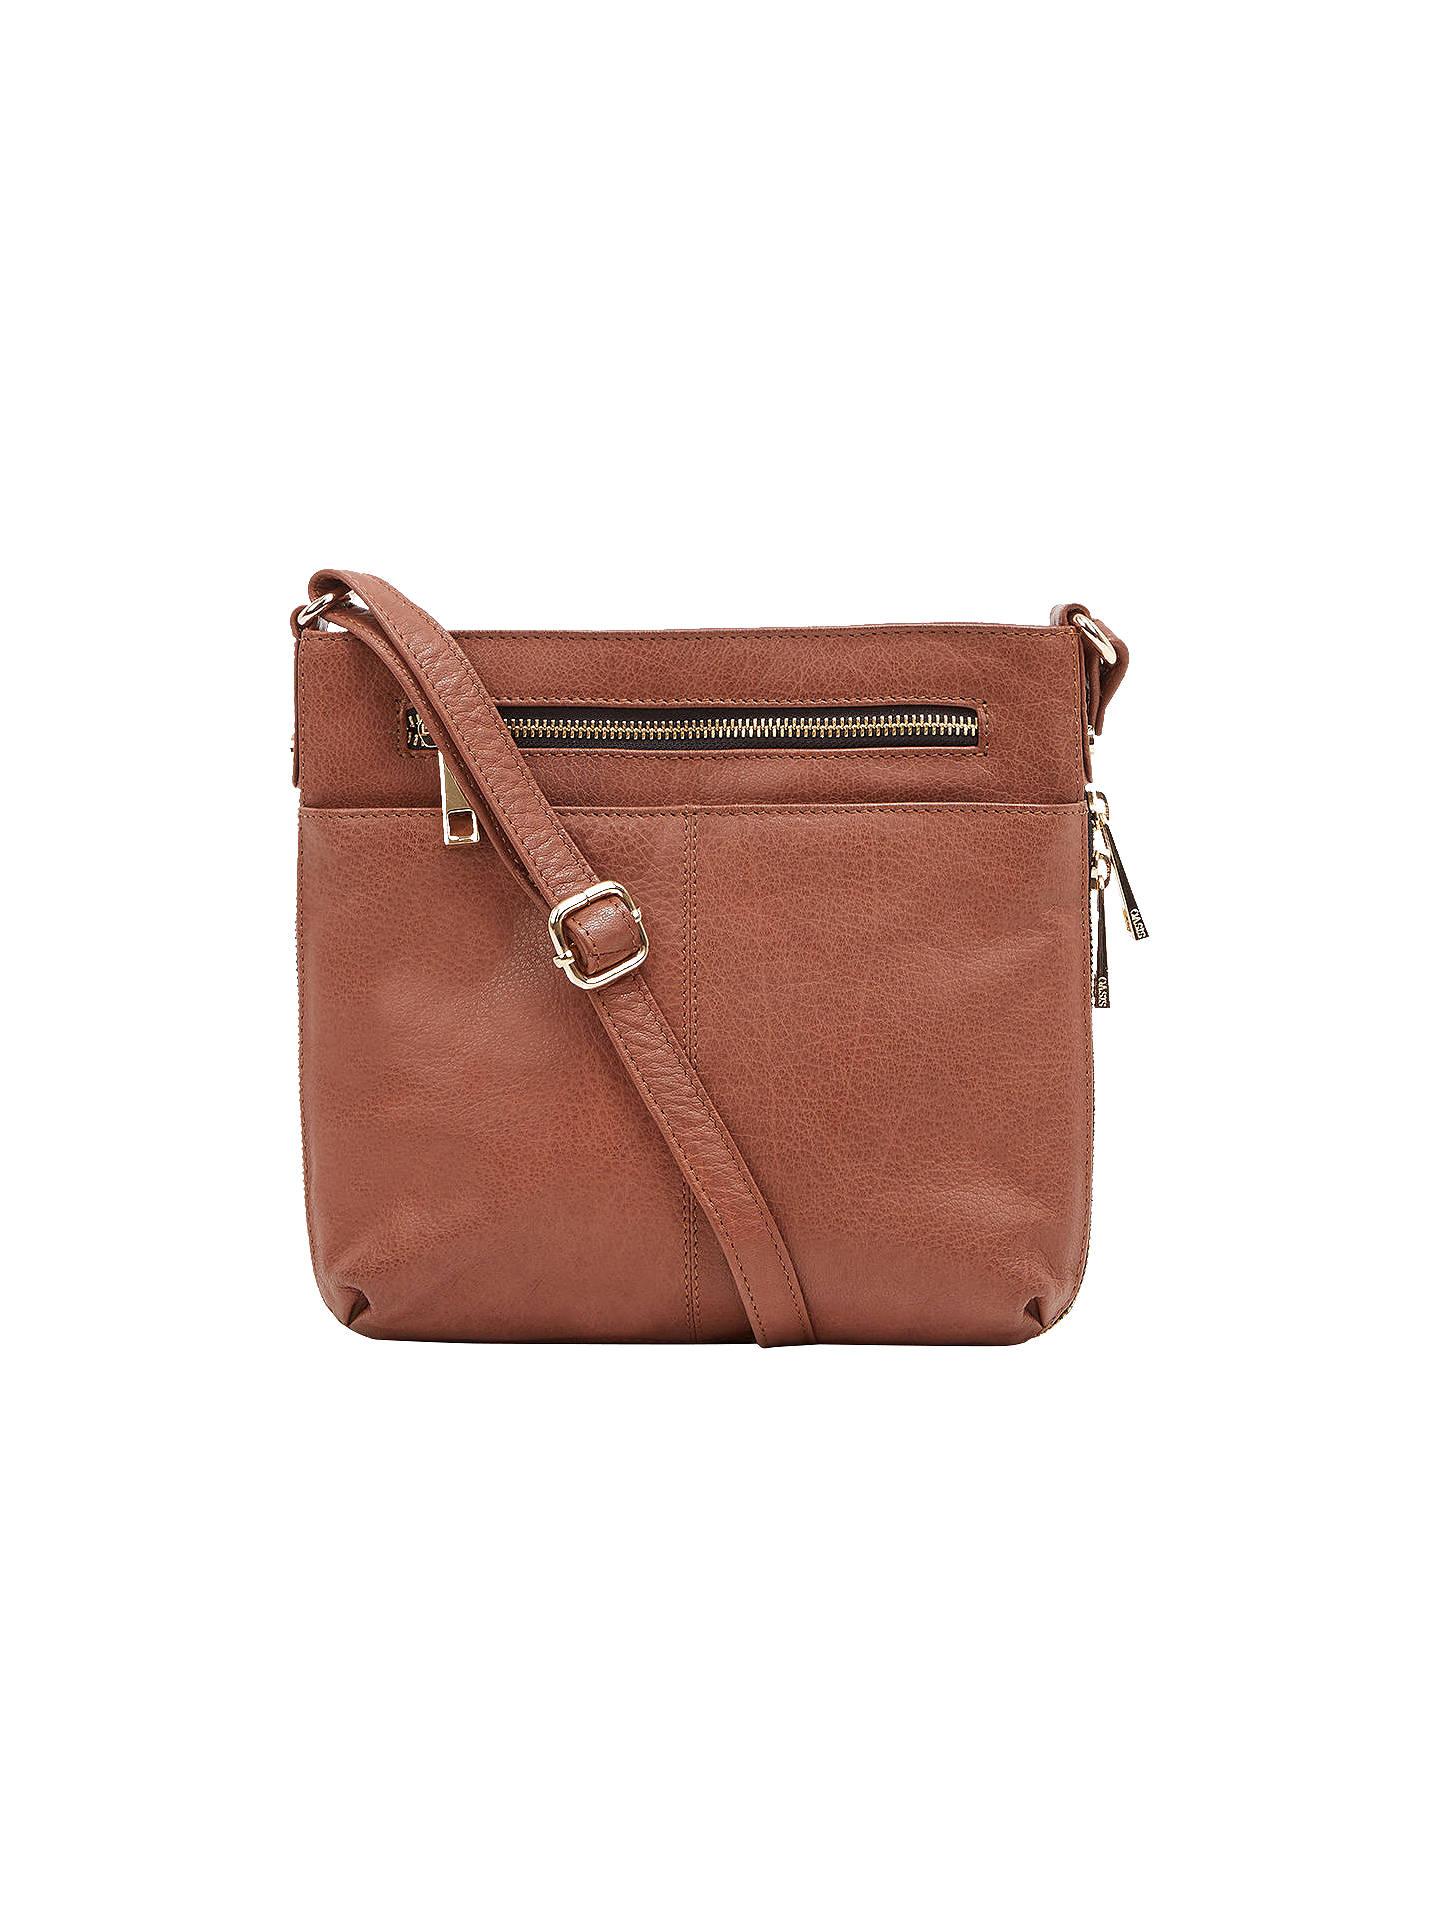 ae035baa33ba Buy Oasis Anais Cross Body Bag, Tan Online at johnlewis.com ...